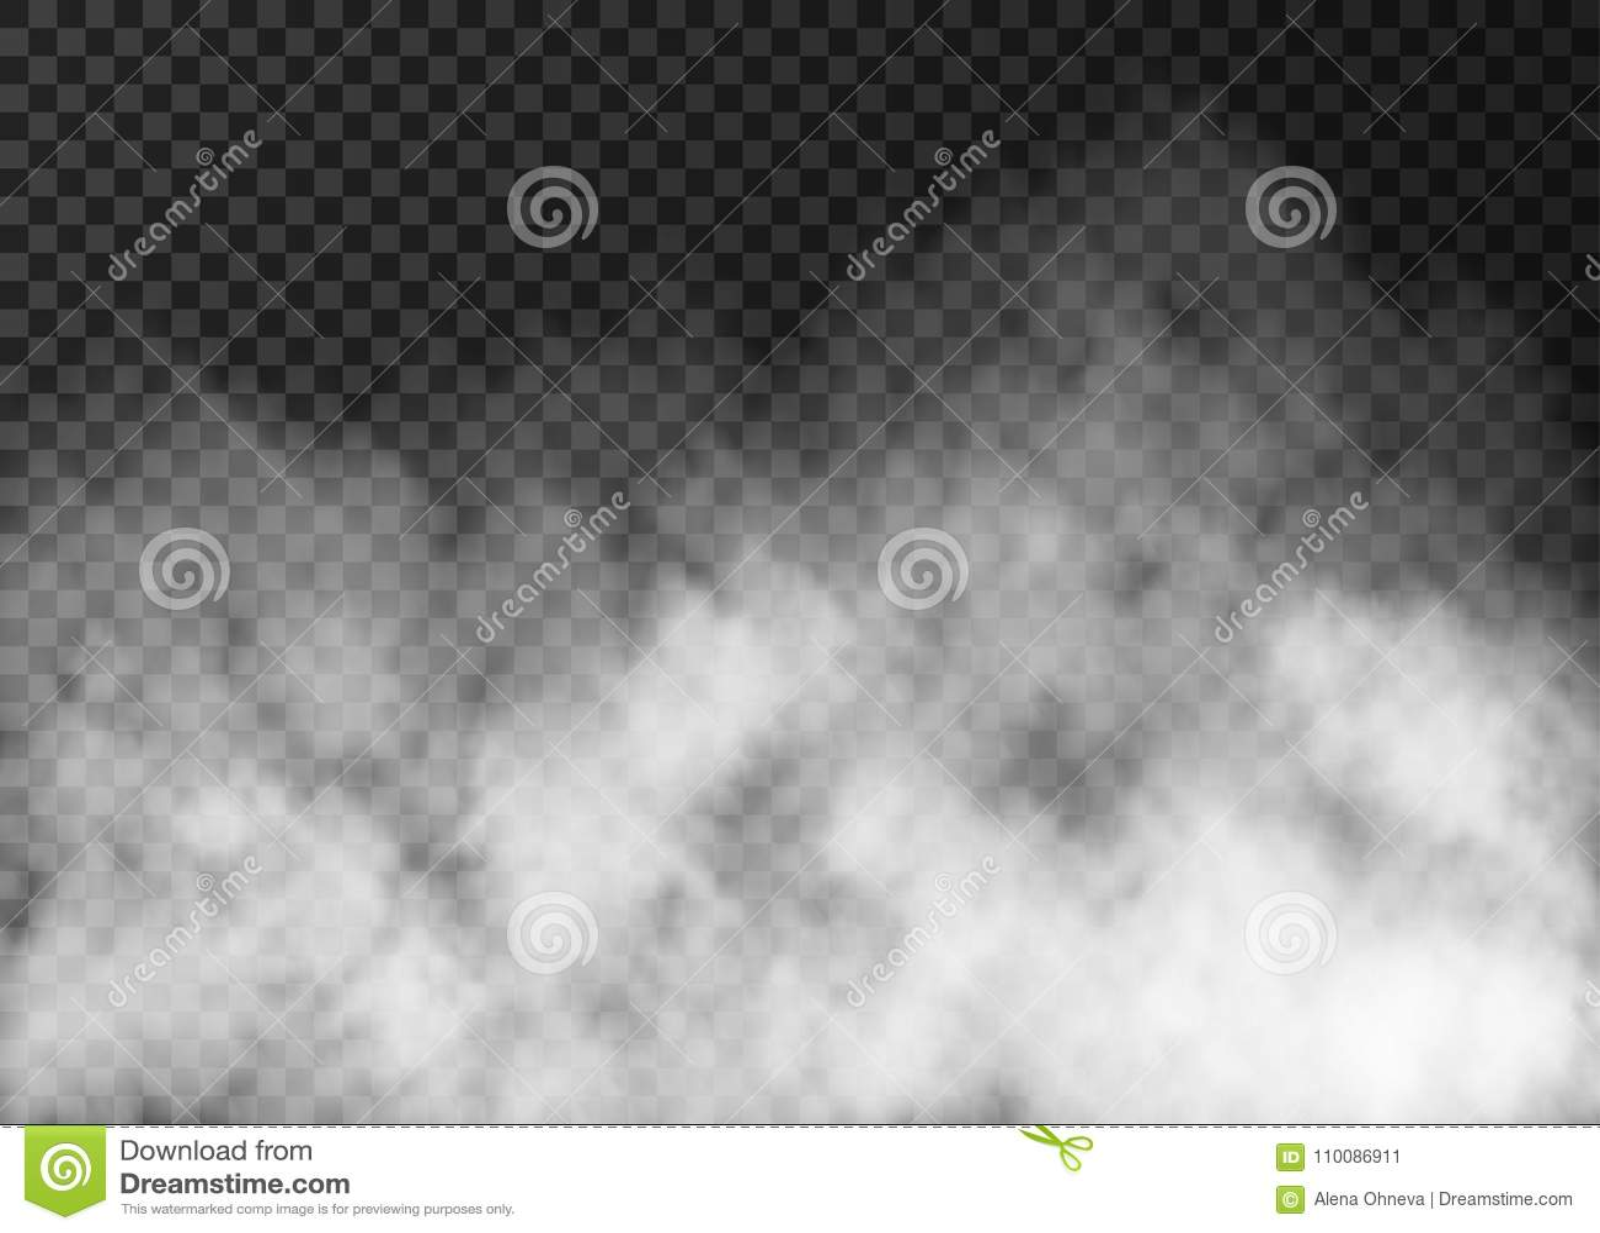 White smoke texture on transparent background.